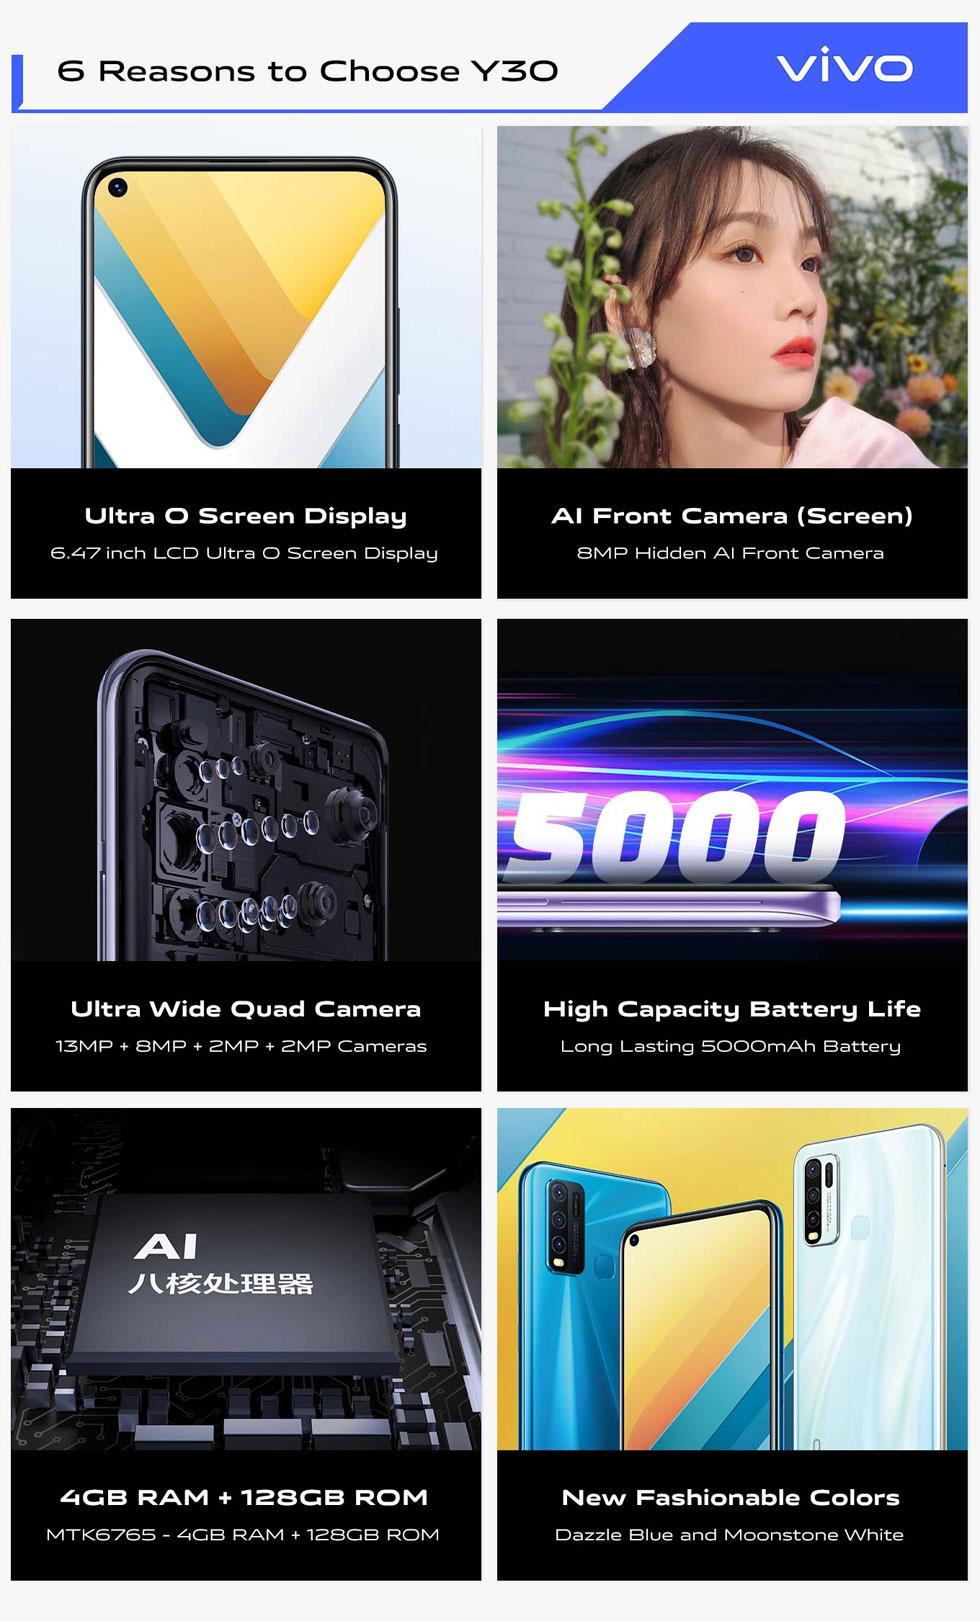 vivo Y30大马发布:6.47寸挖孔屏、Helio P35、后置超广角四摄、5000mAh电池,售RM899! Vivo-Y30-1-1-2.jpg?r